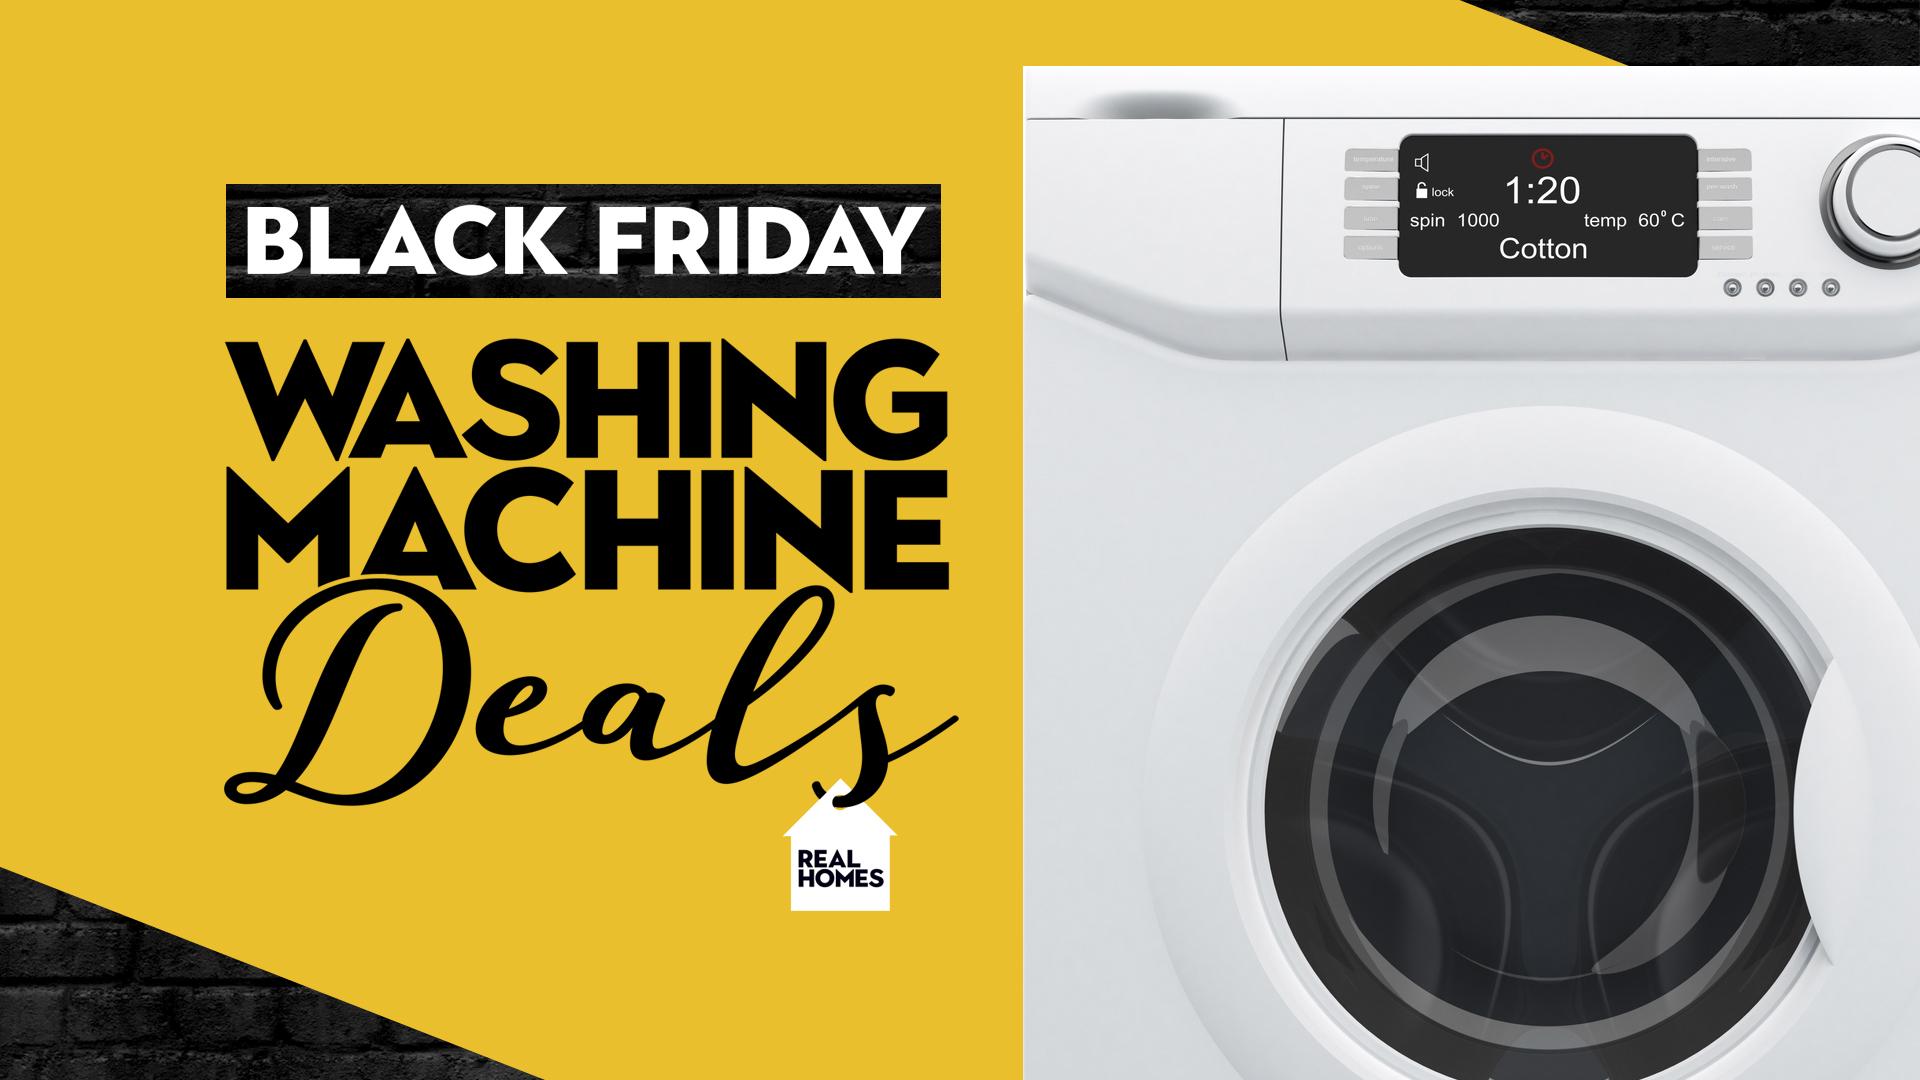 Black Friday Washing Machine Deals Real Homes